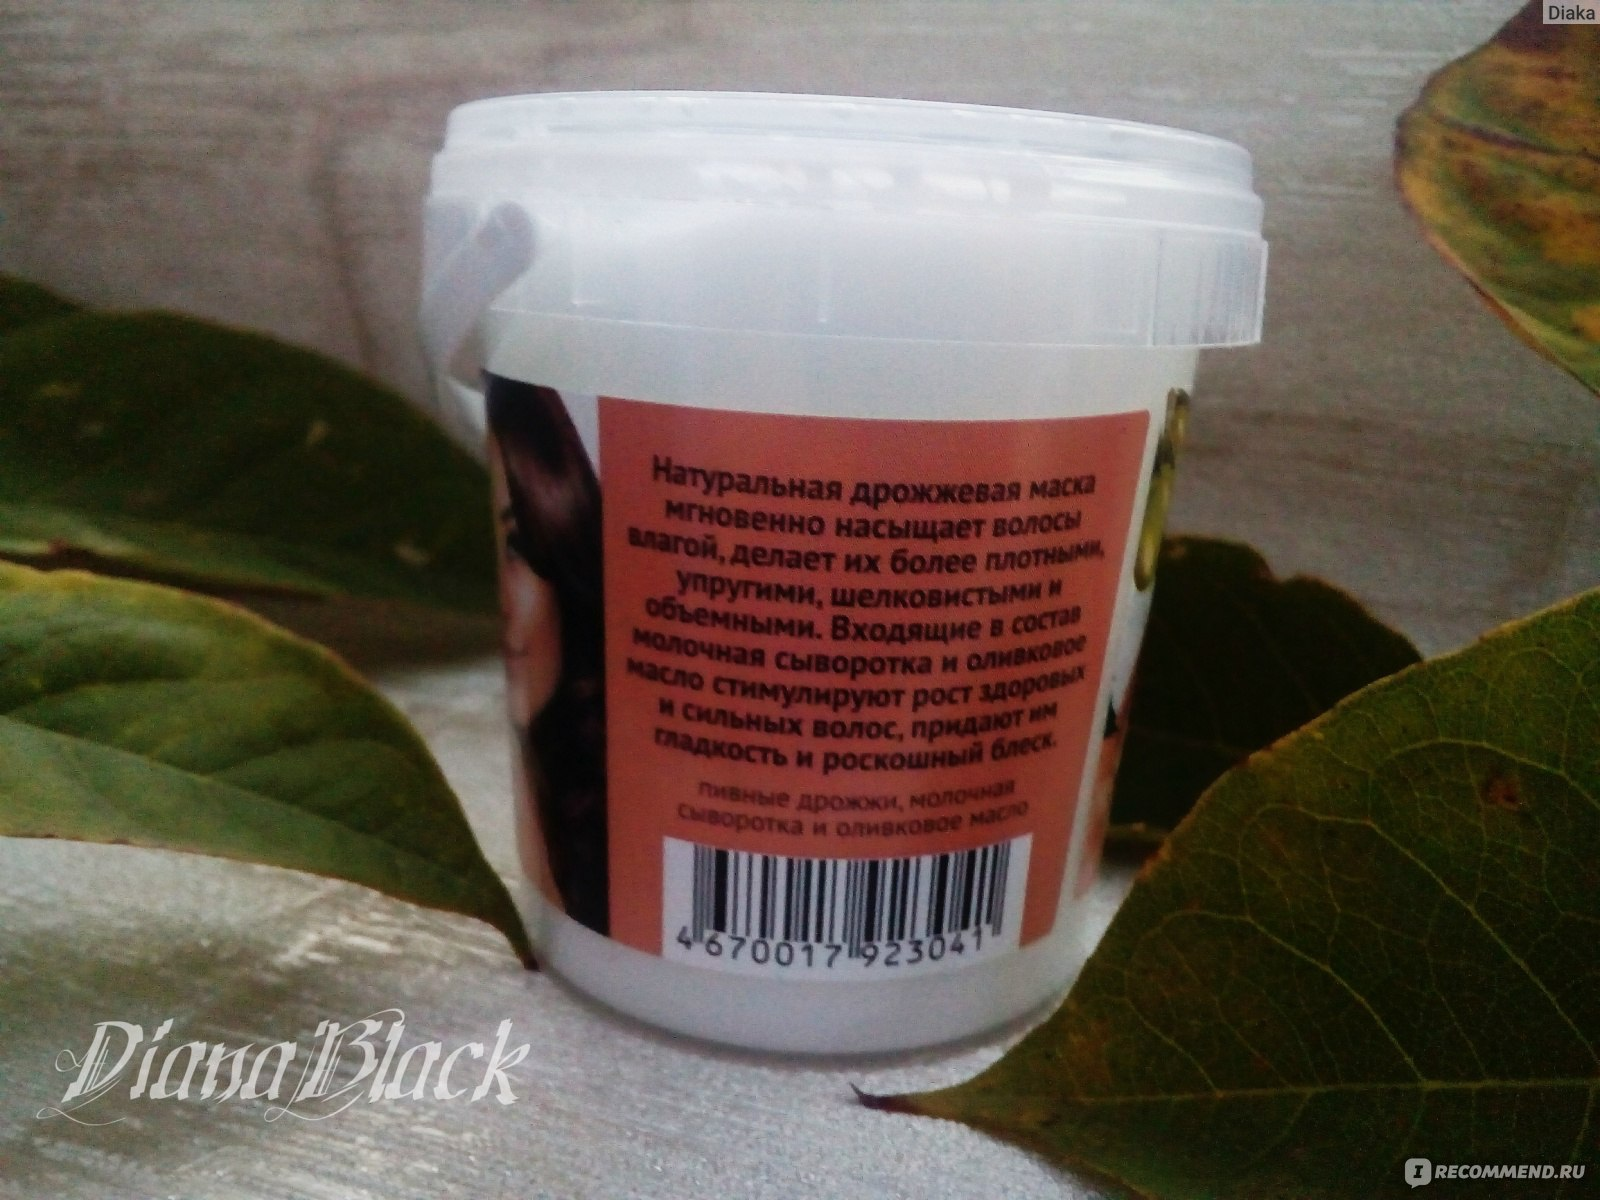 Маски для волос с живыми дрожжами